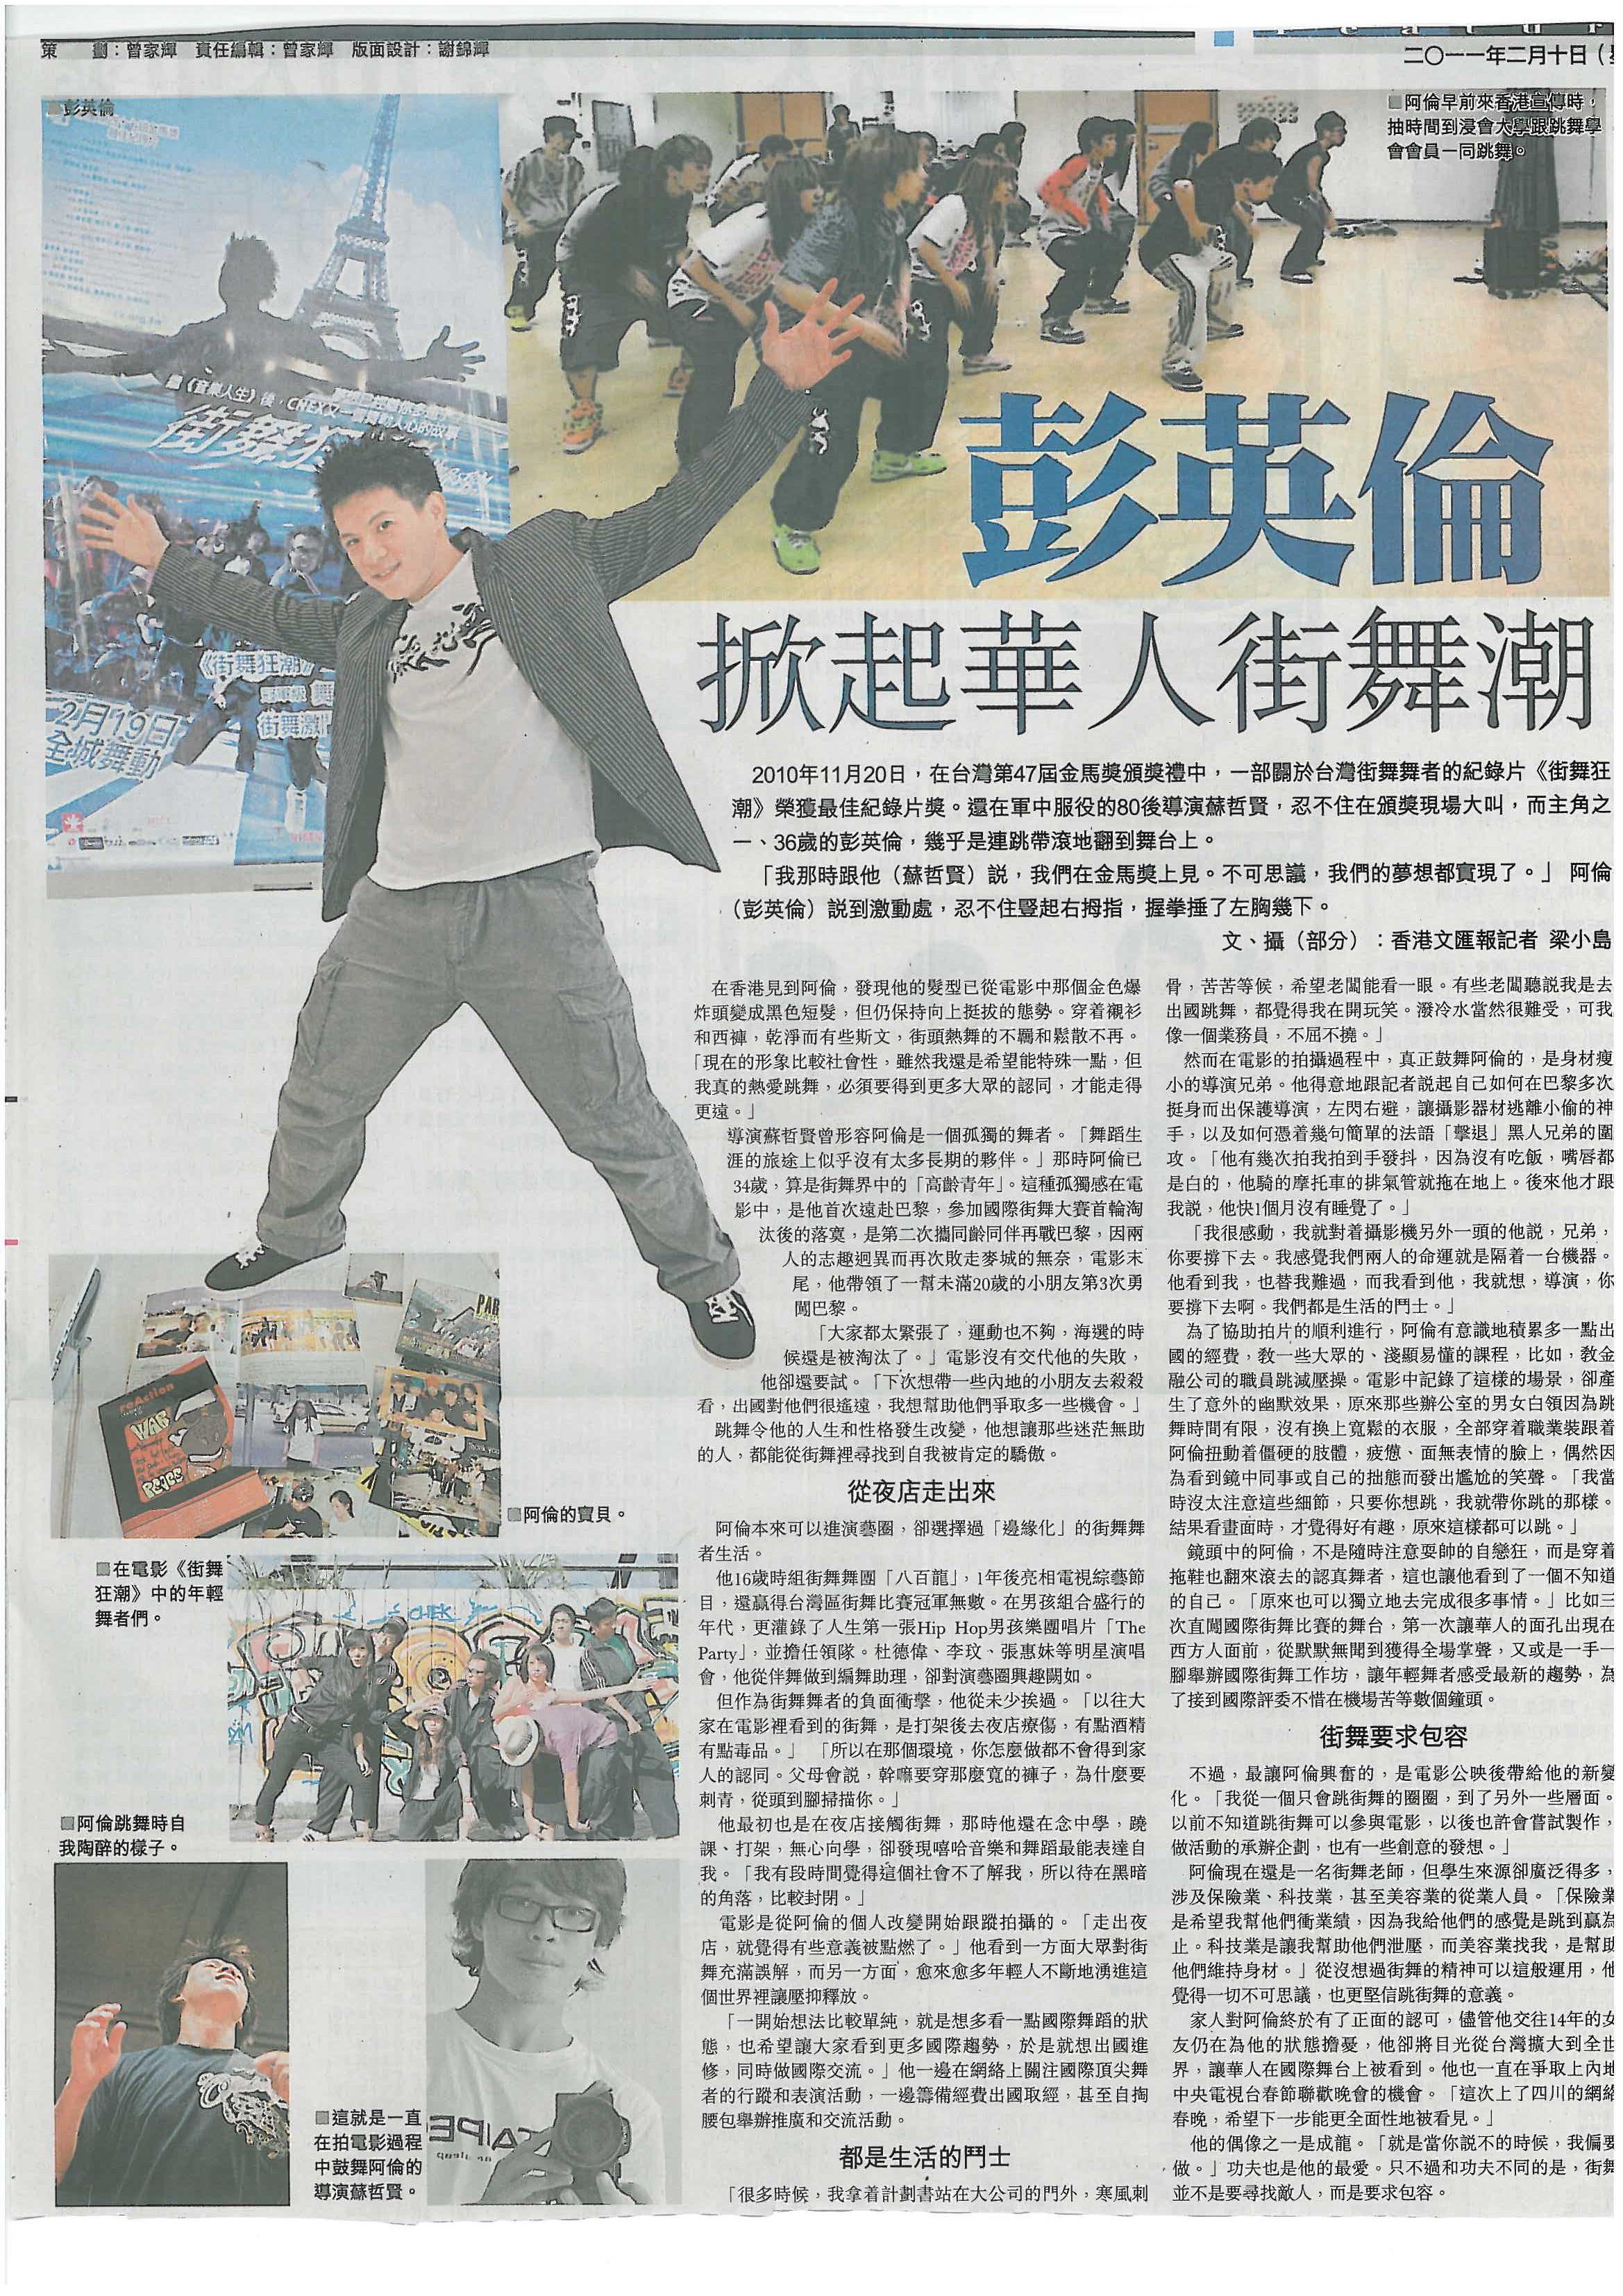 20110210_Wenweipo(hps).jpg